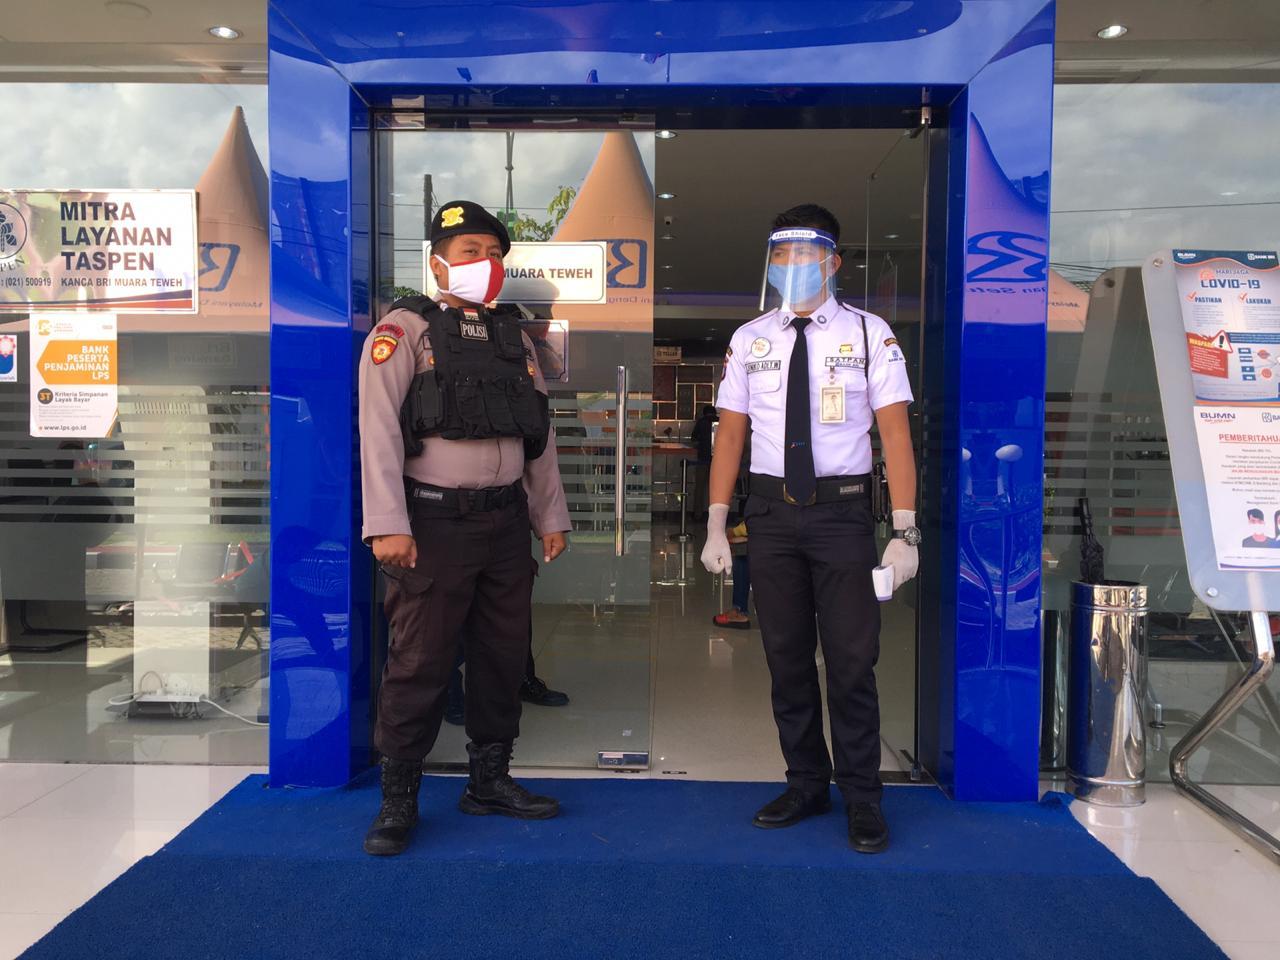 Tingkatkan Keamanan, Patroli Sabhara Sambangi Satpam Bank